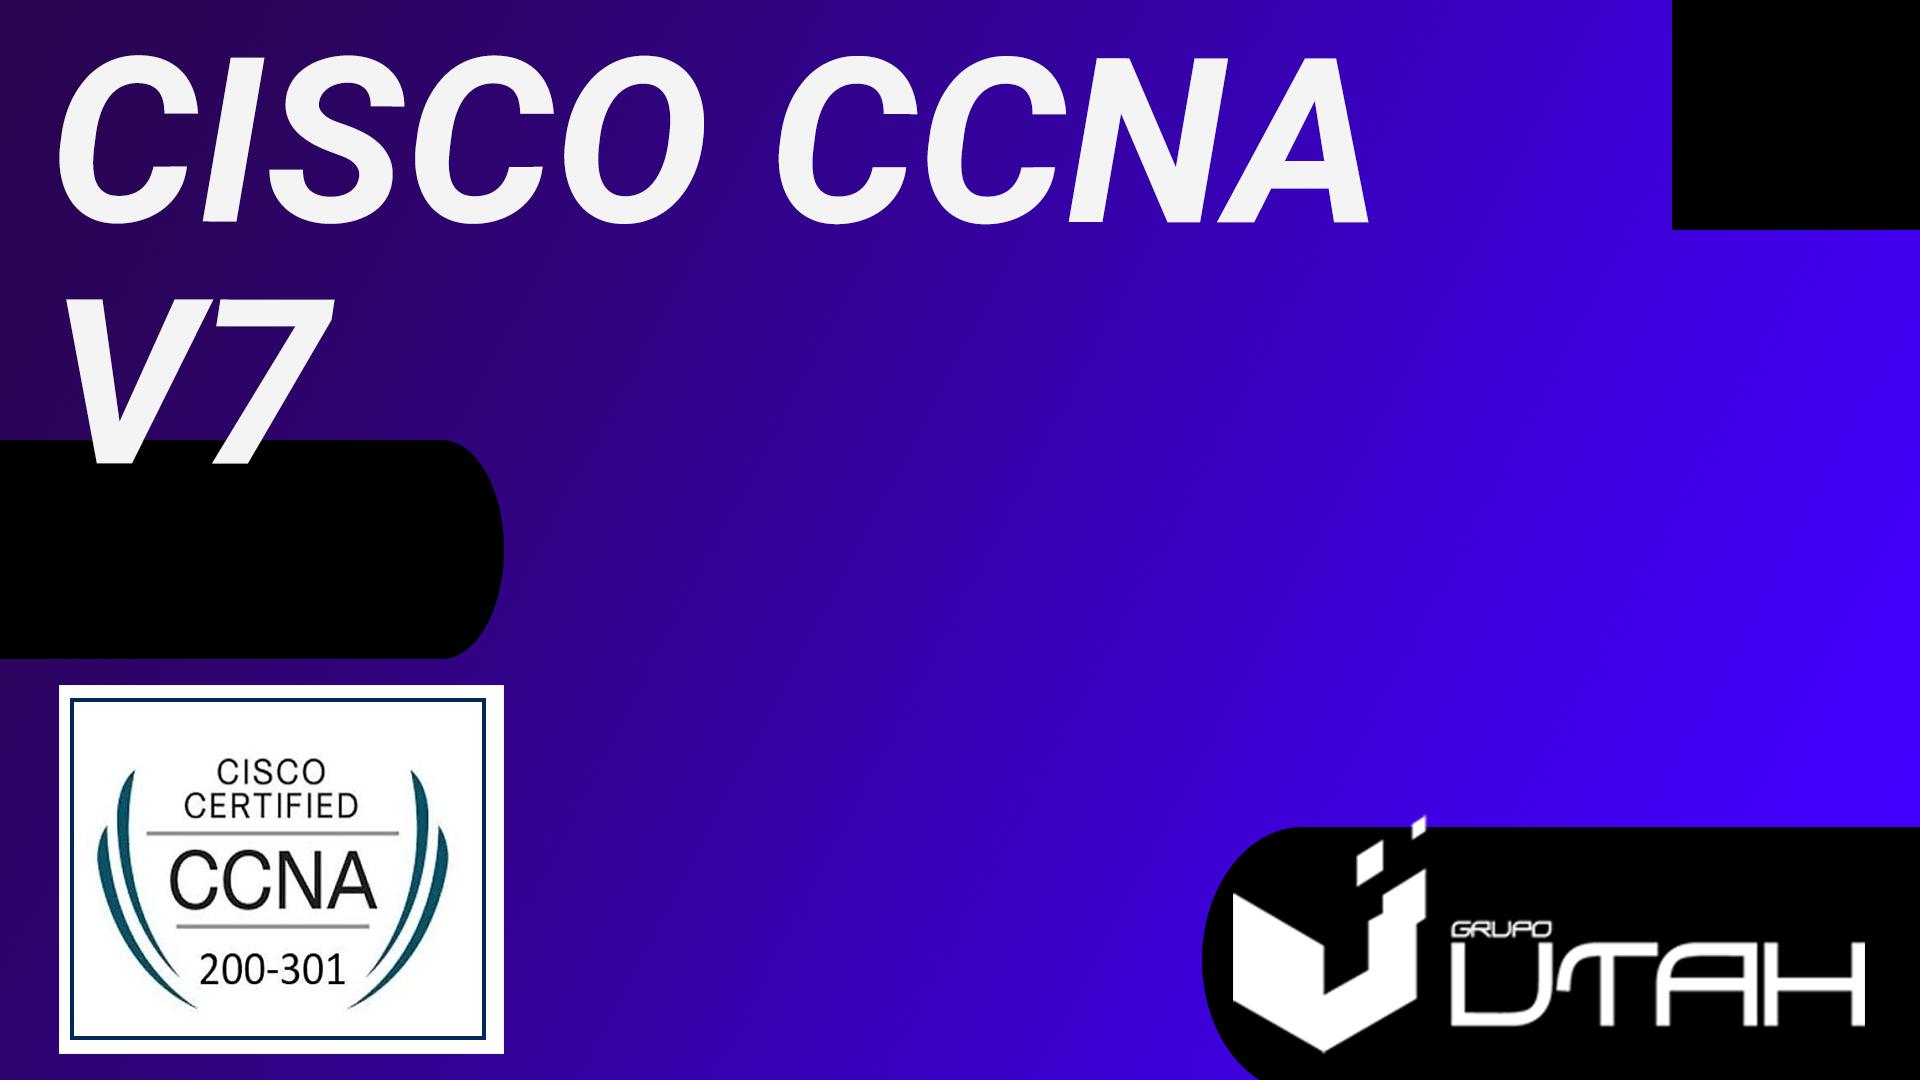 CISCO - CCNA V7 -N6 - 2021